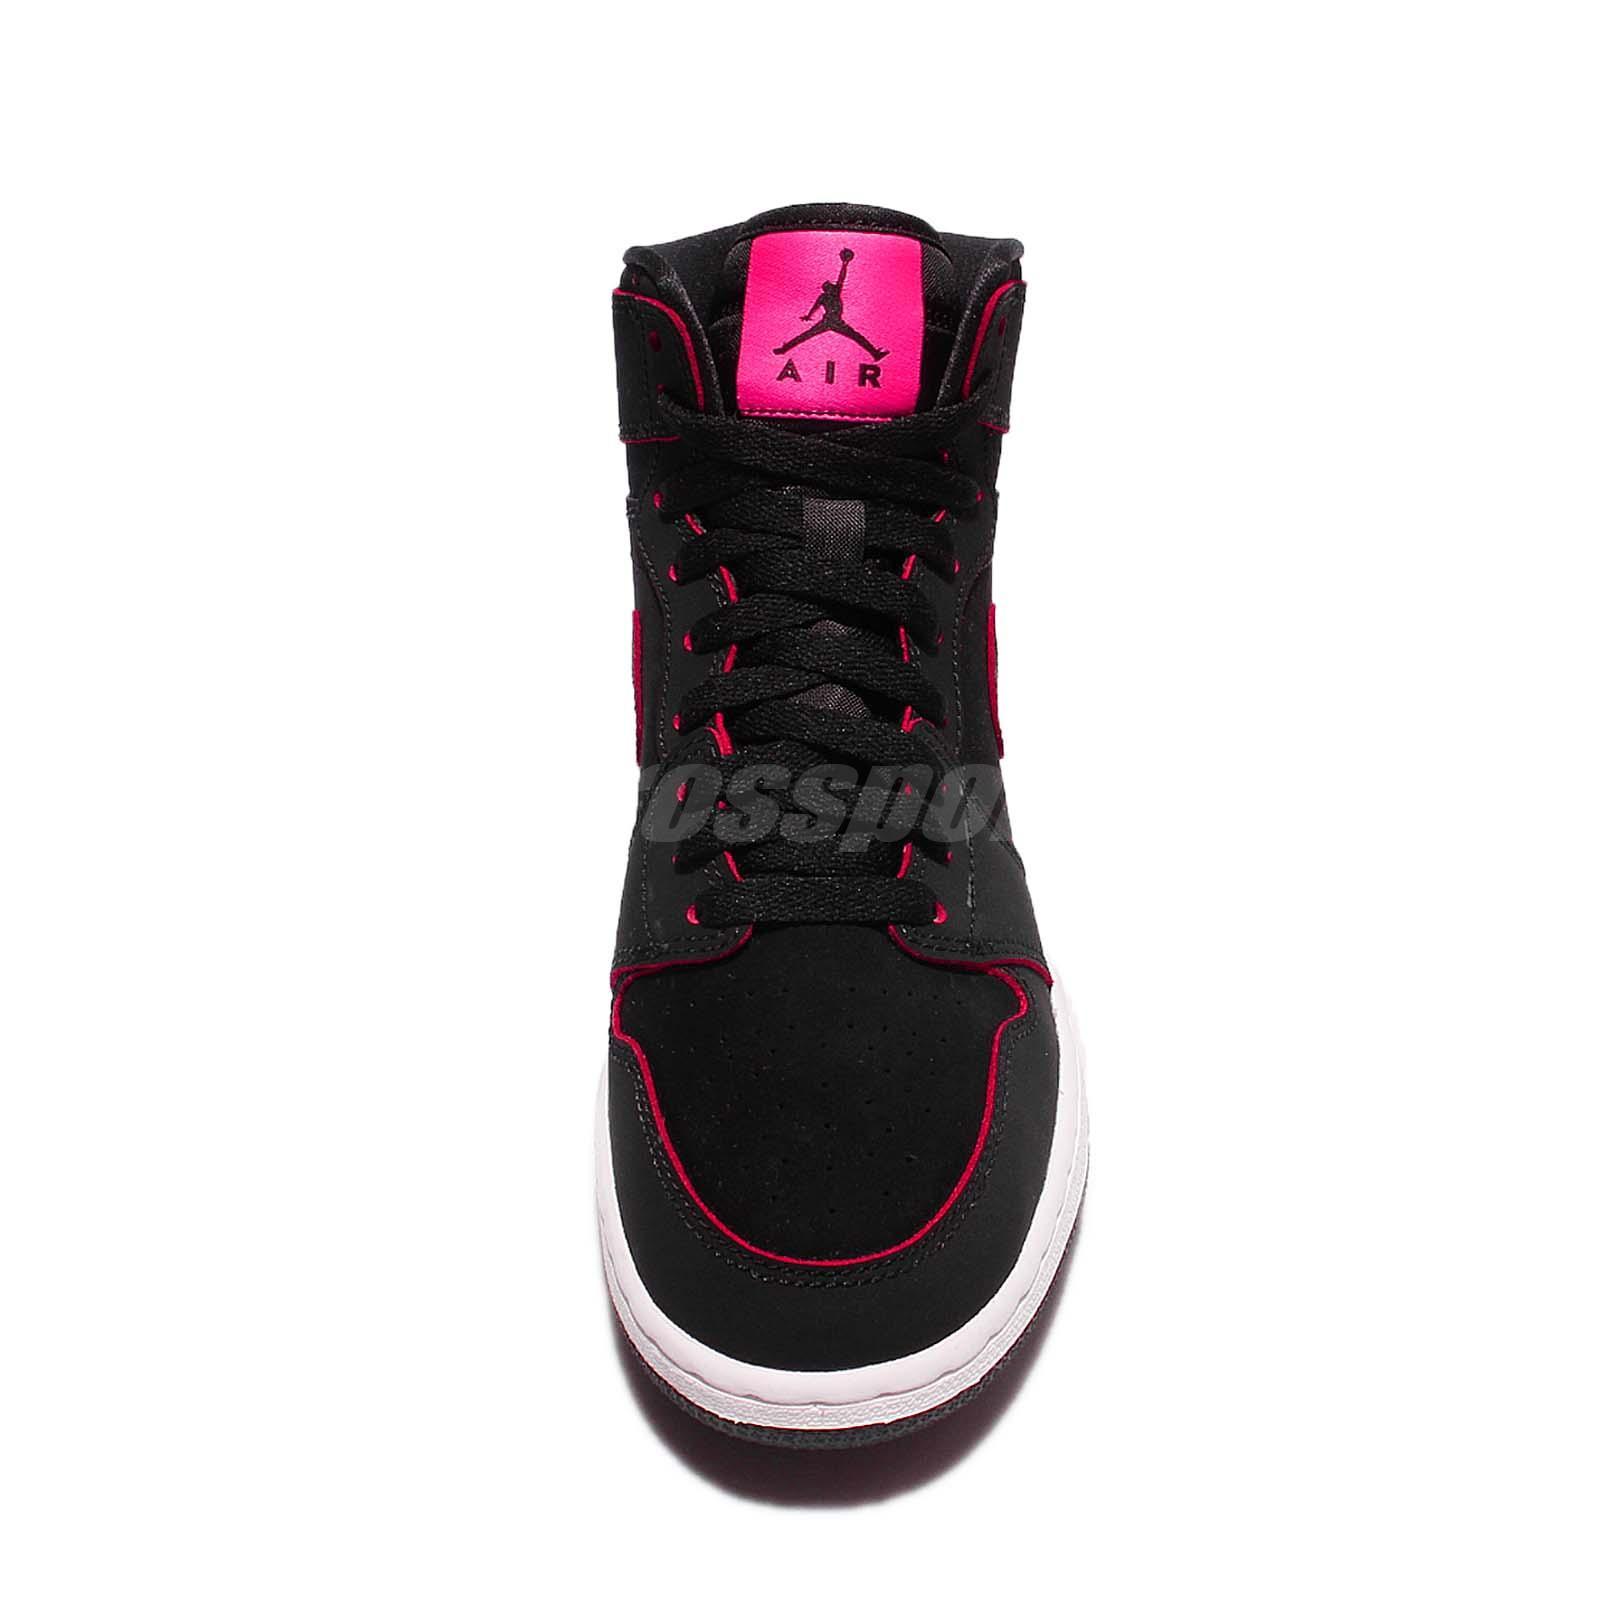 3be41 838be  order nike air jordan 1 retro high gg kids girls women  basketball shoes fe452 9e3c6 eef47600b